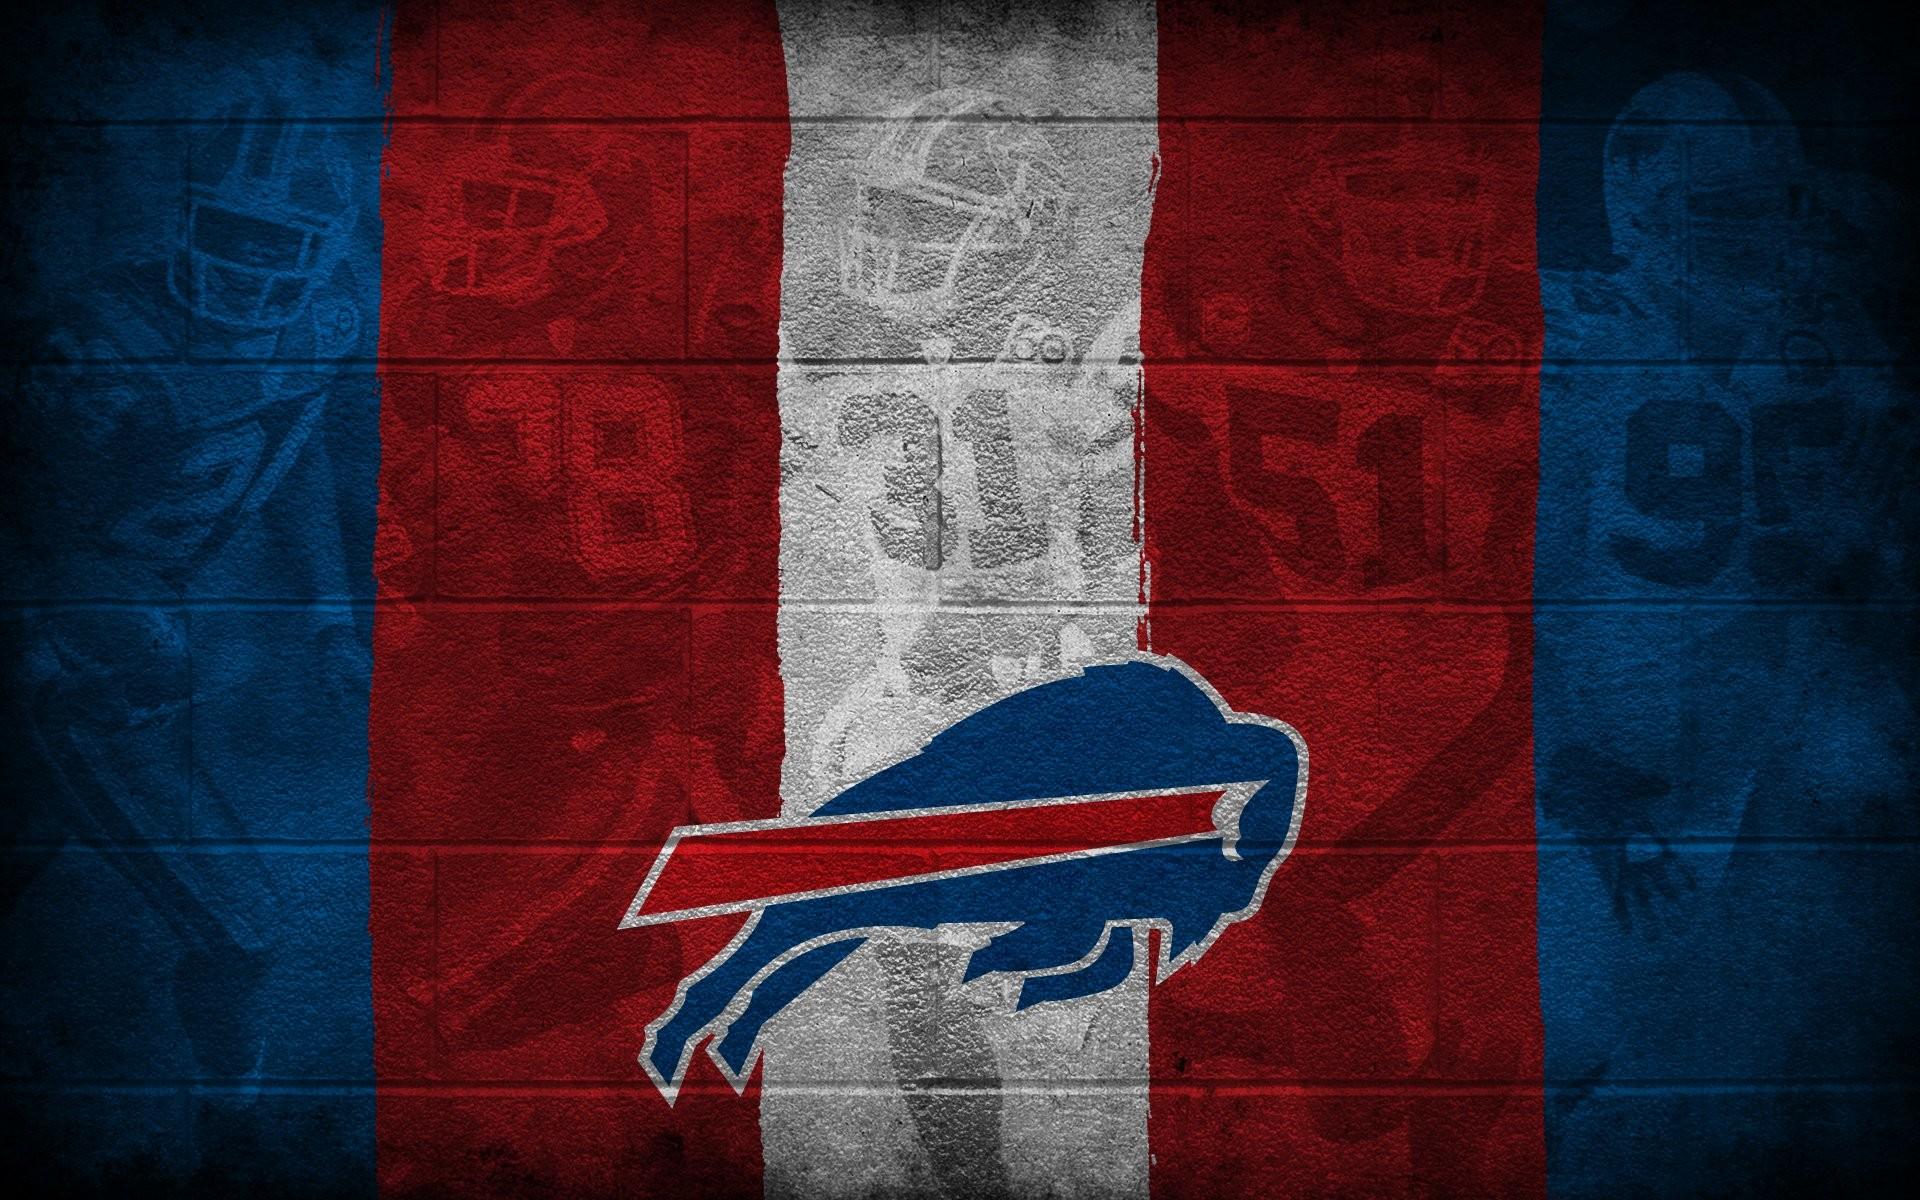 Buffalo Bills 345164